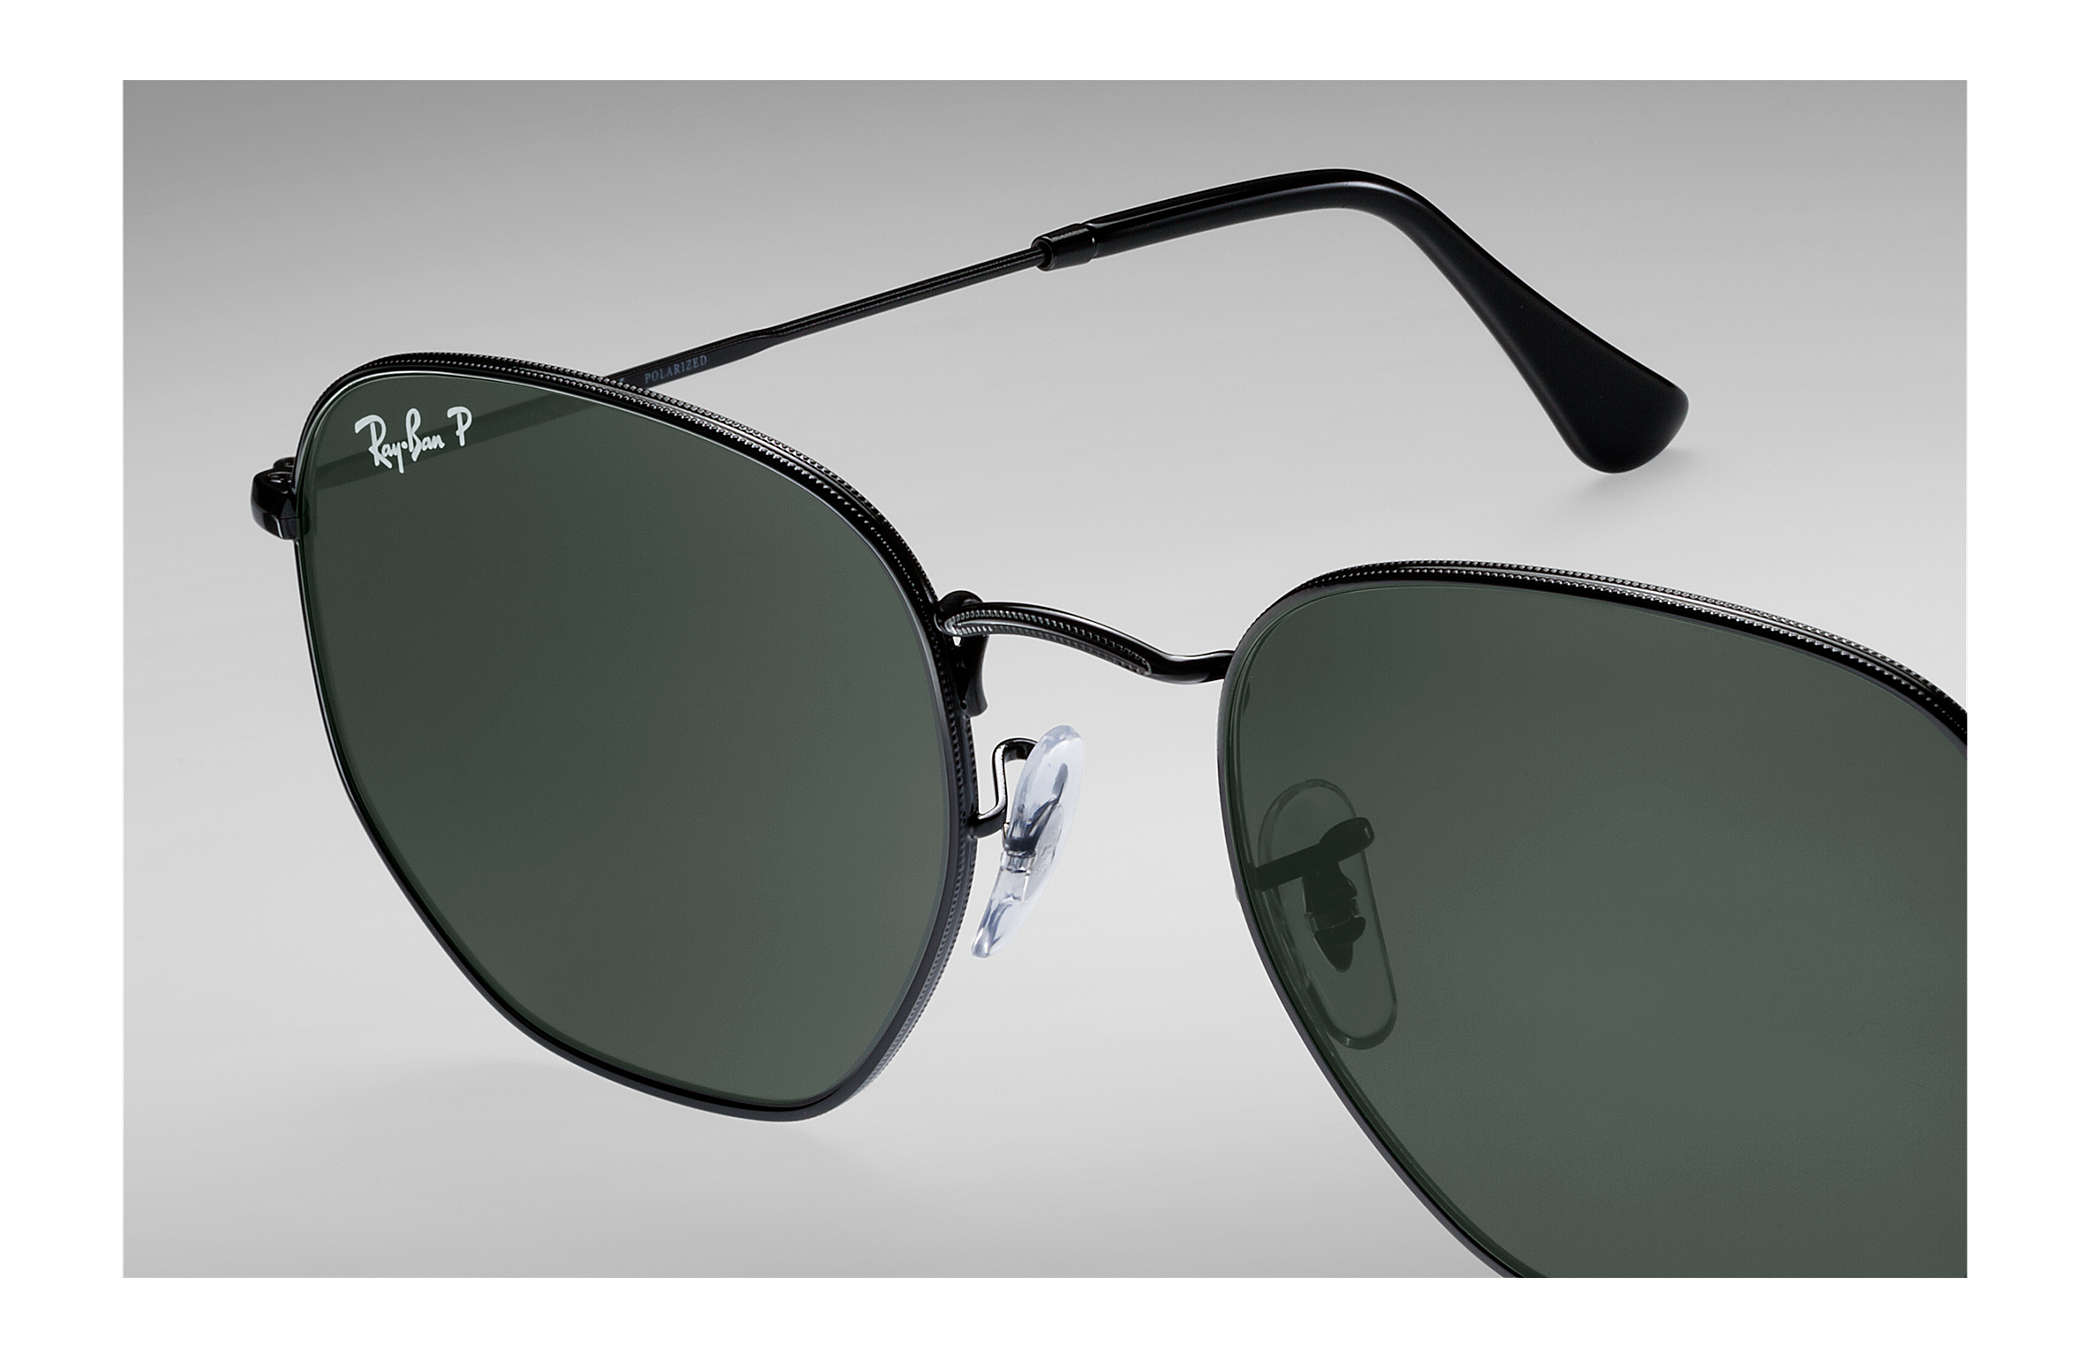 0663f72240c Ray-Ban Hexagonal Flat Lenses RB3548N Black - Metal - Green ...